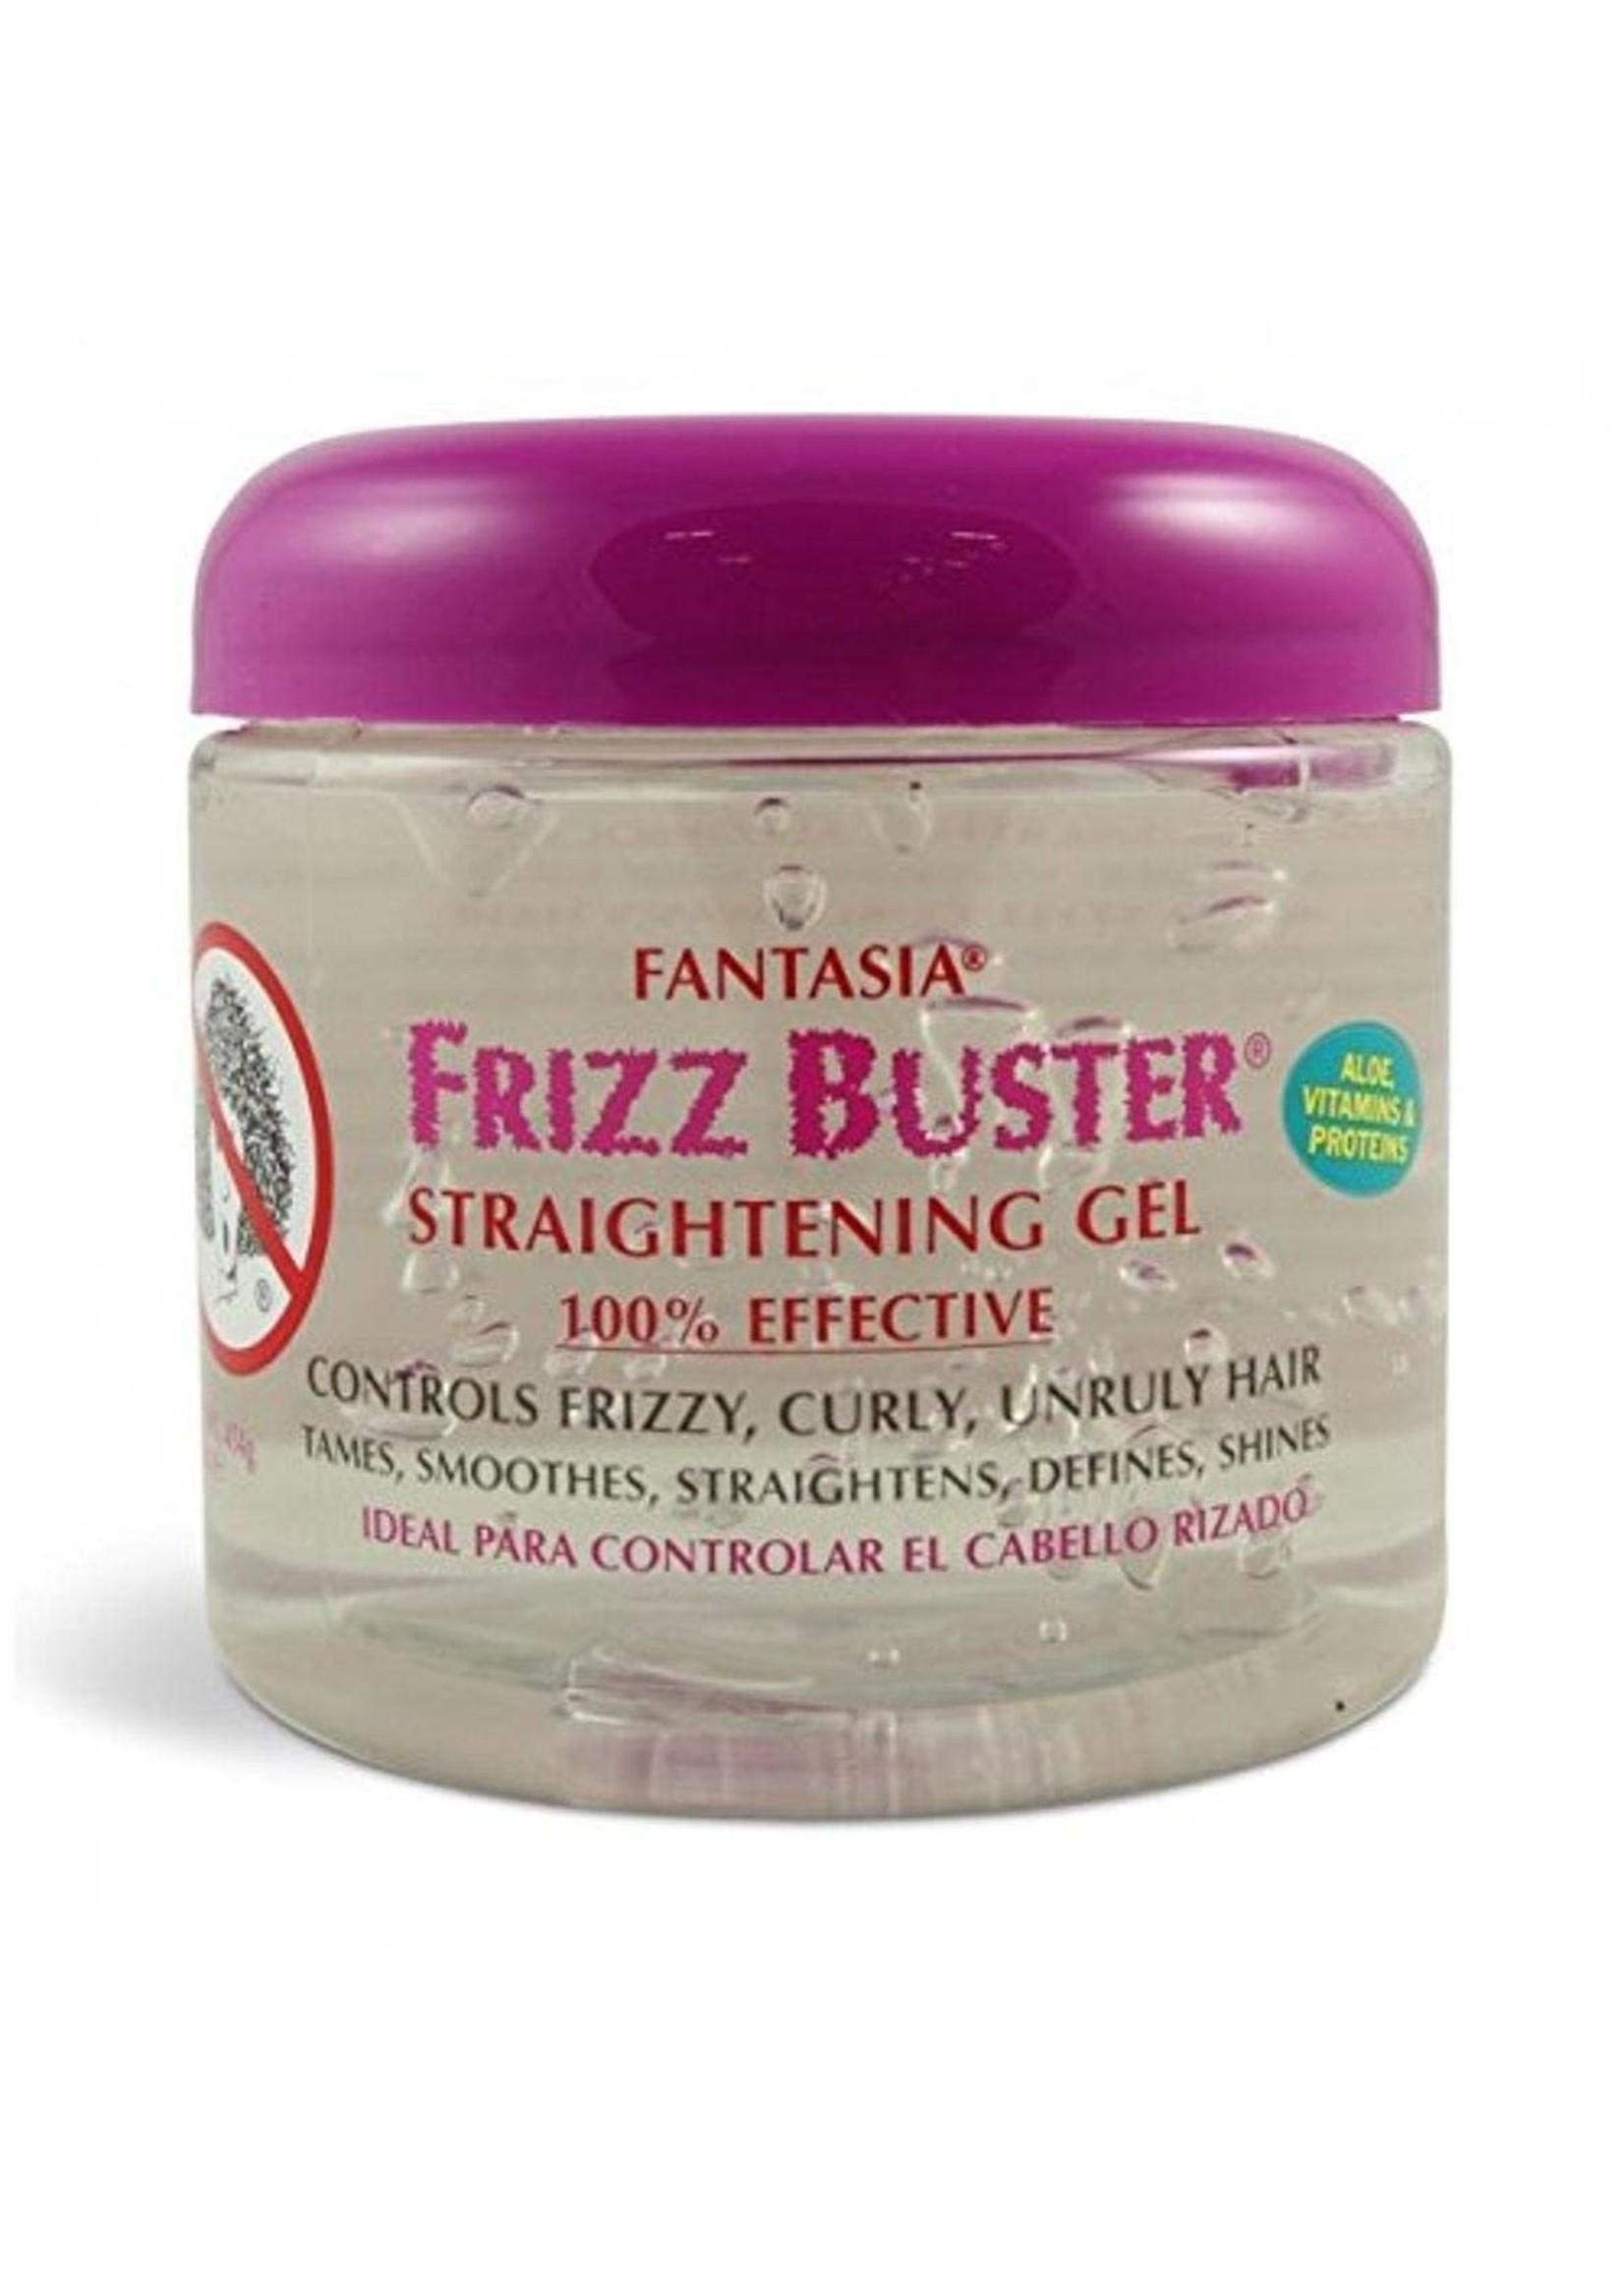 Fantasia Frizz Buster Straightening Gel 16oz